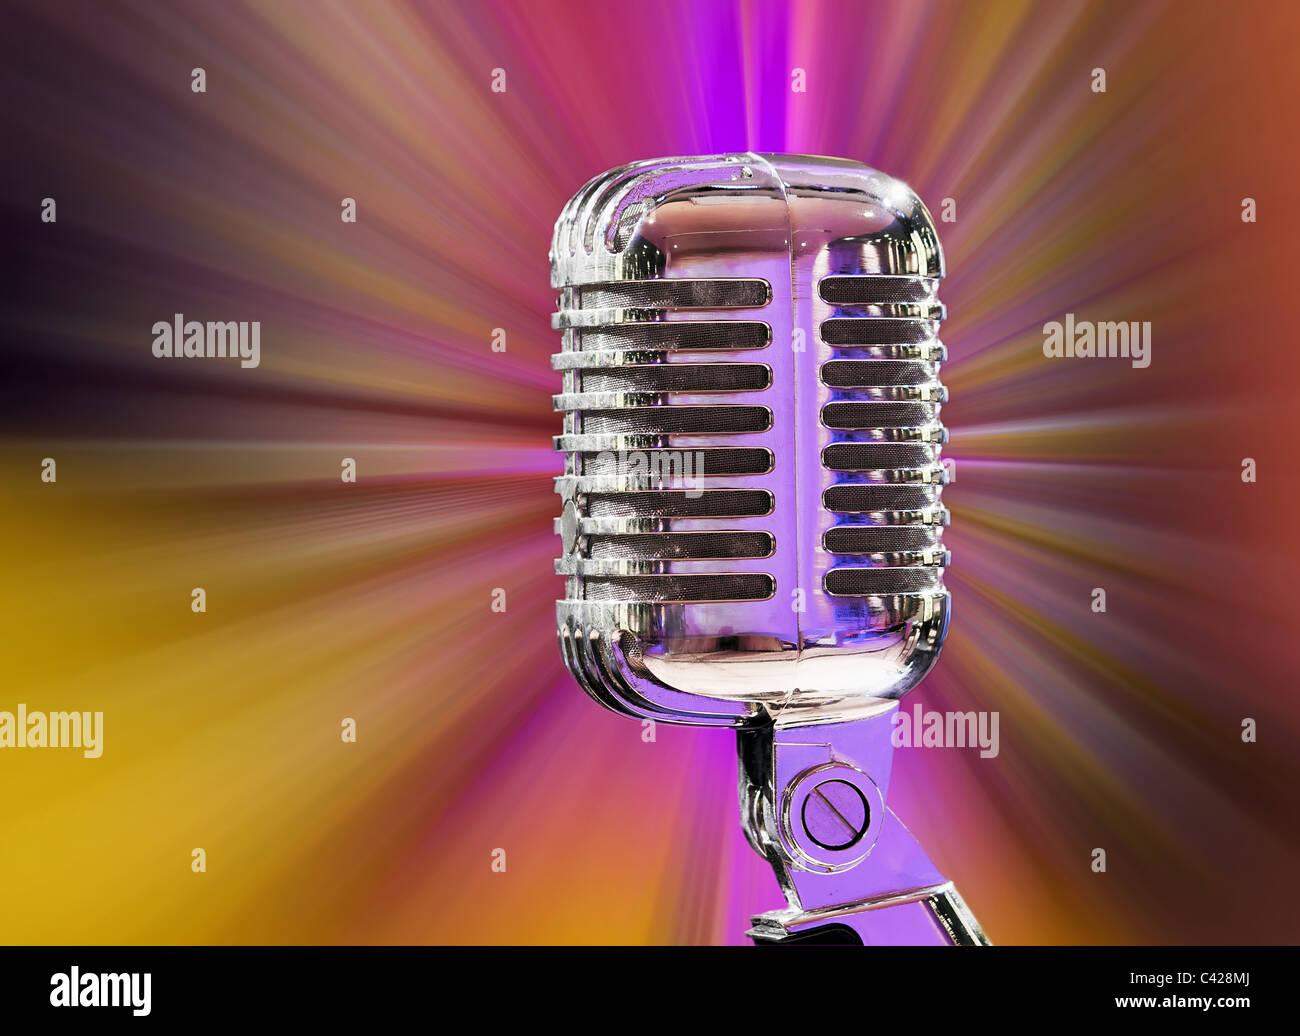 microphone - Stock Image